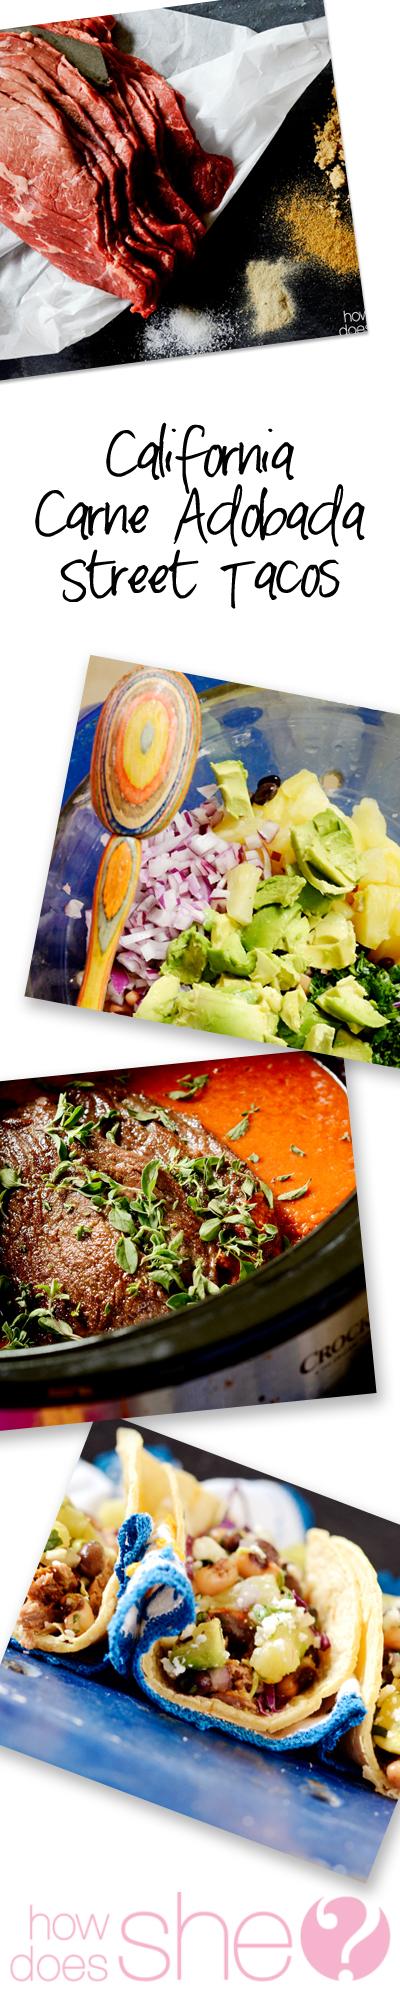 California Carne Adobada Street Tacos